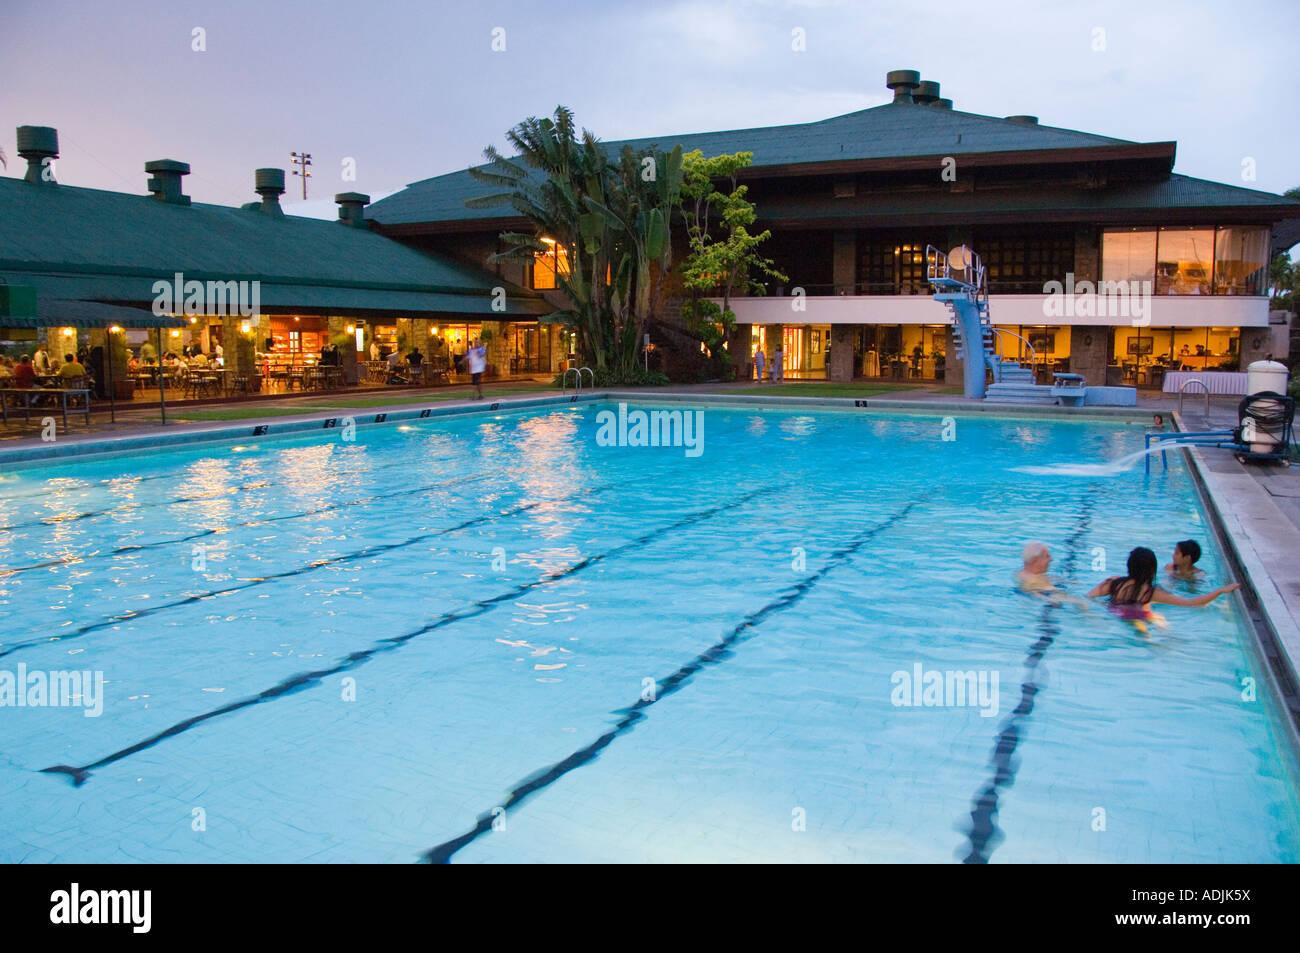 philippines manila manila polo club swimming pool stock photo 13434805 alamy